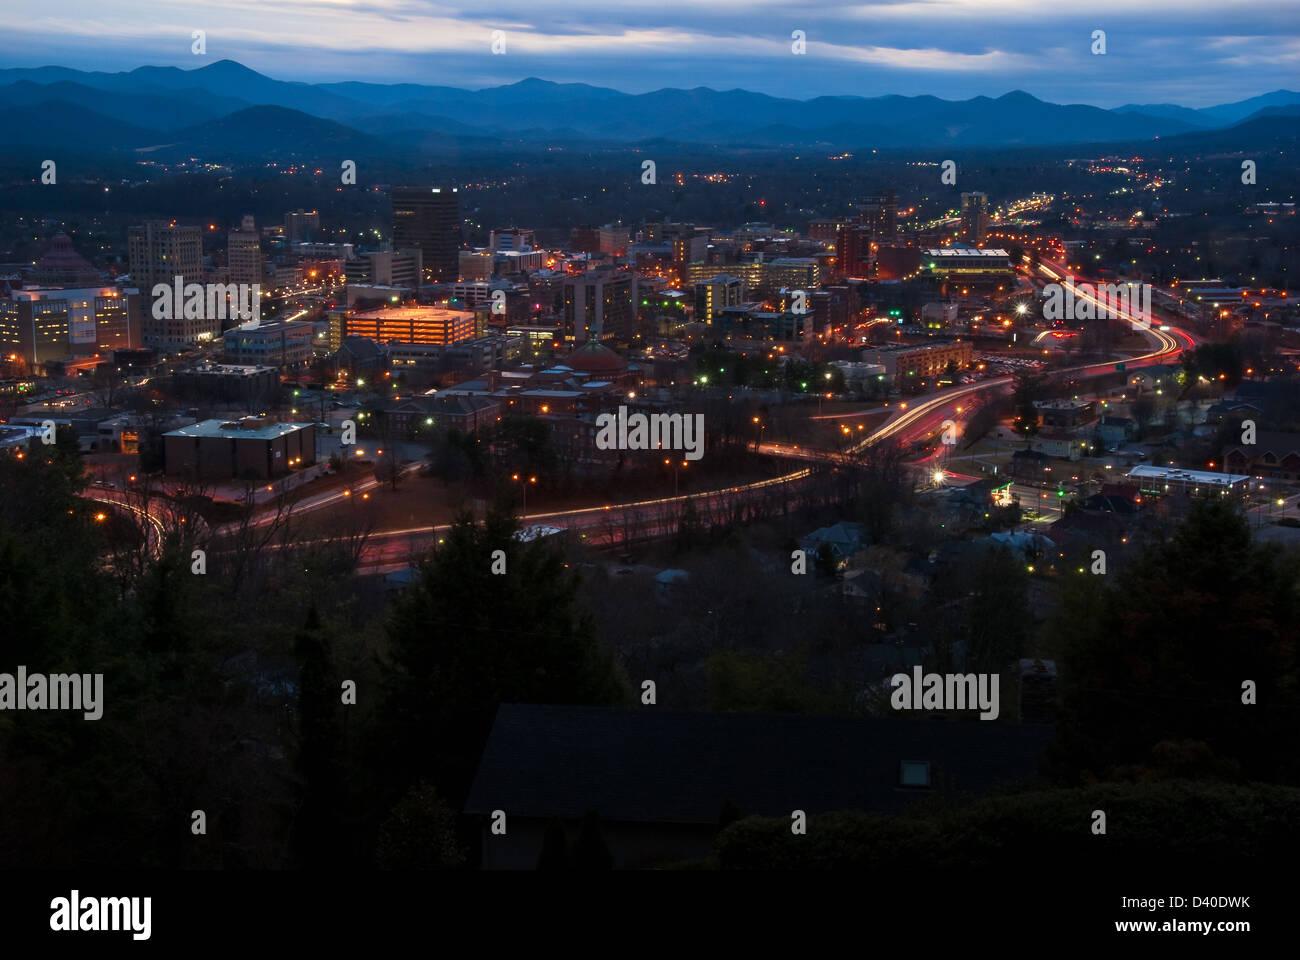 Asheville, North Carolina cityscape and mountain skyline at late dusk. - Stock Image